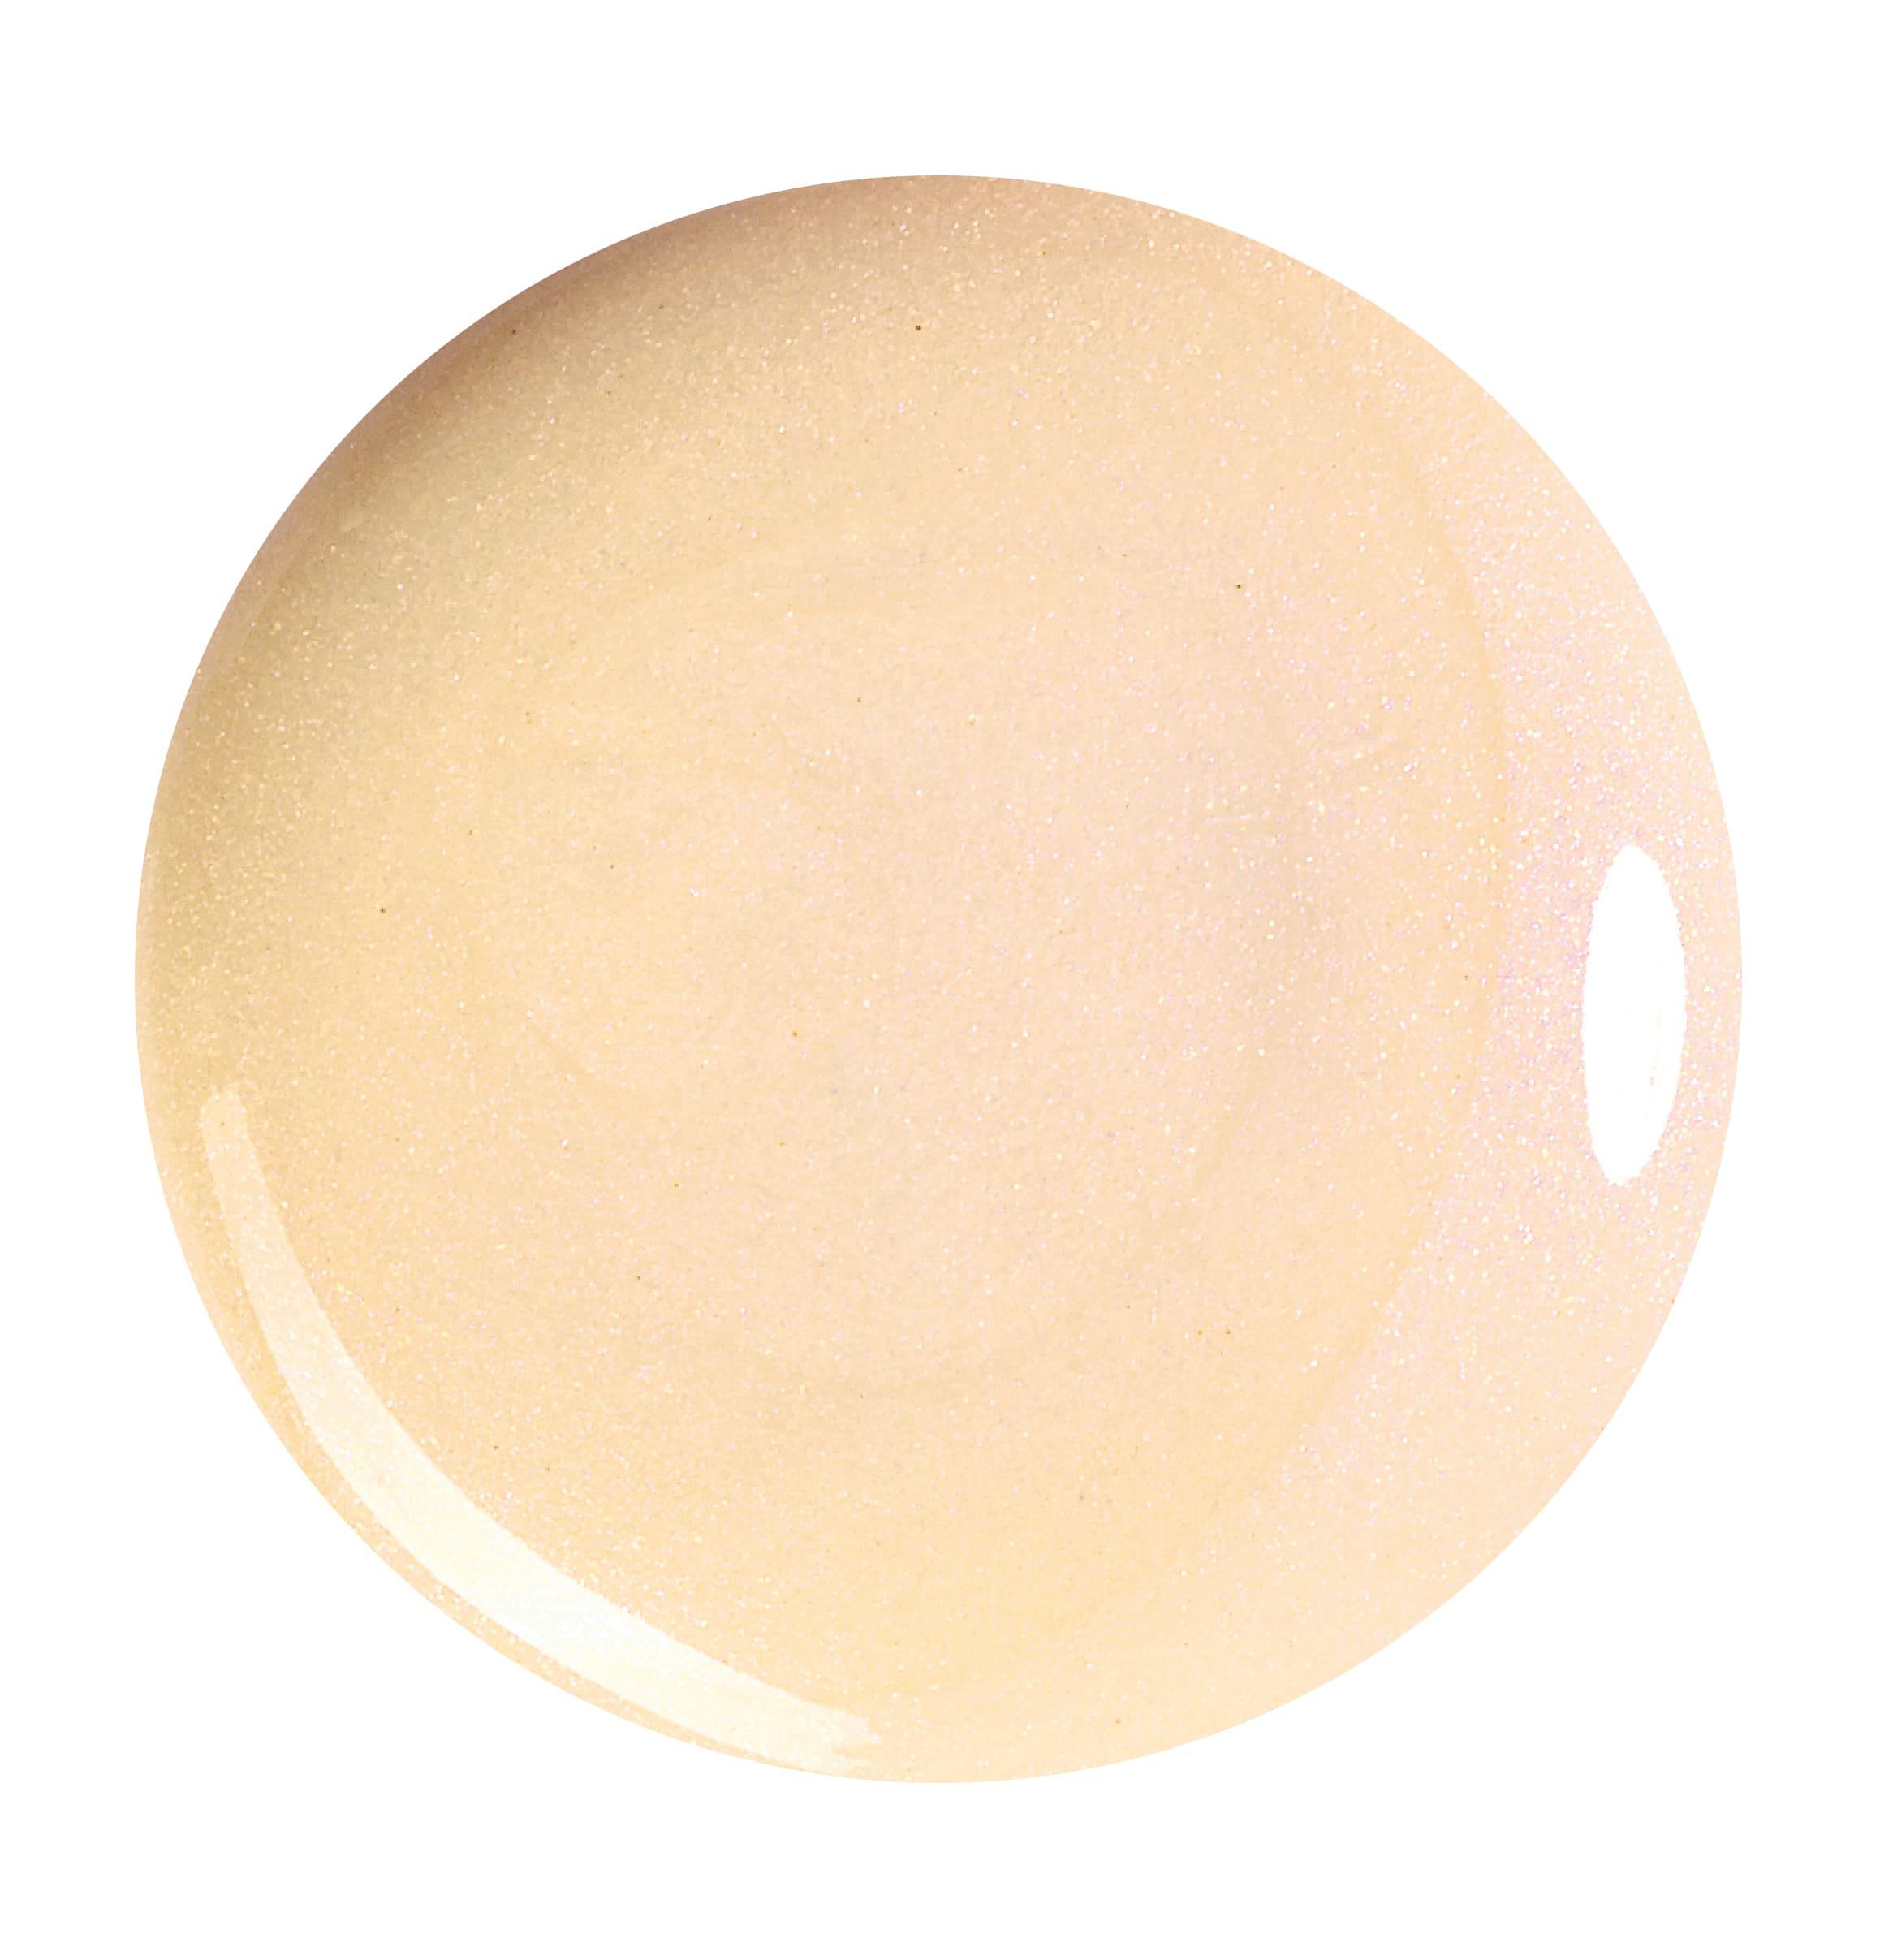 Illuminating Effect Fluid -Sheer Bronze 02-